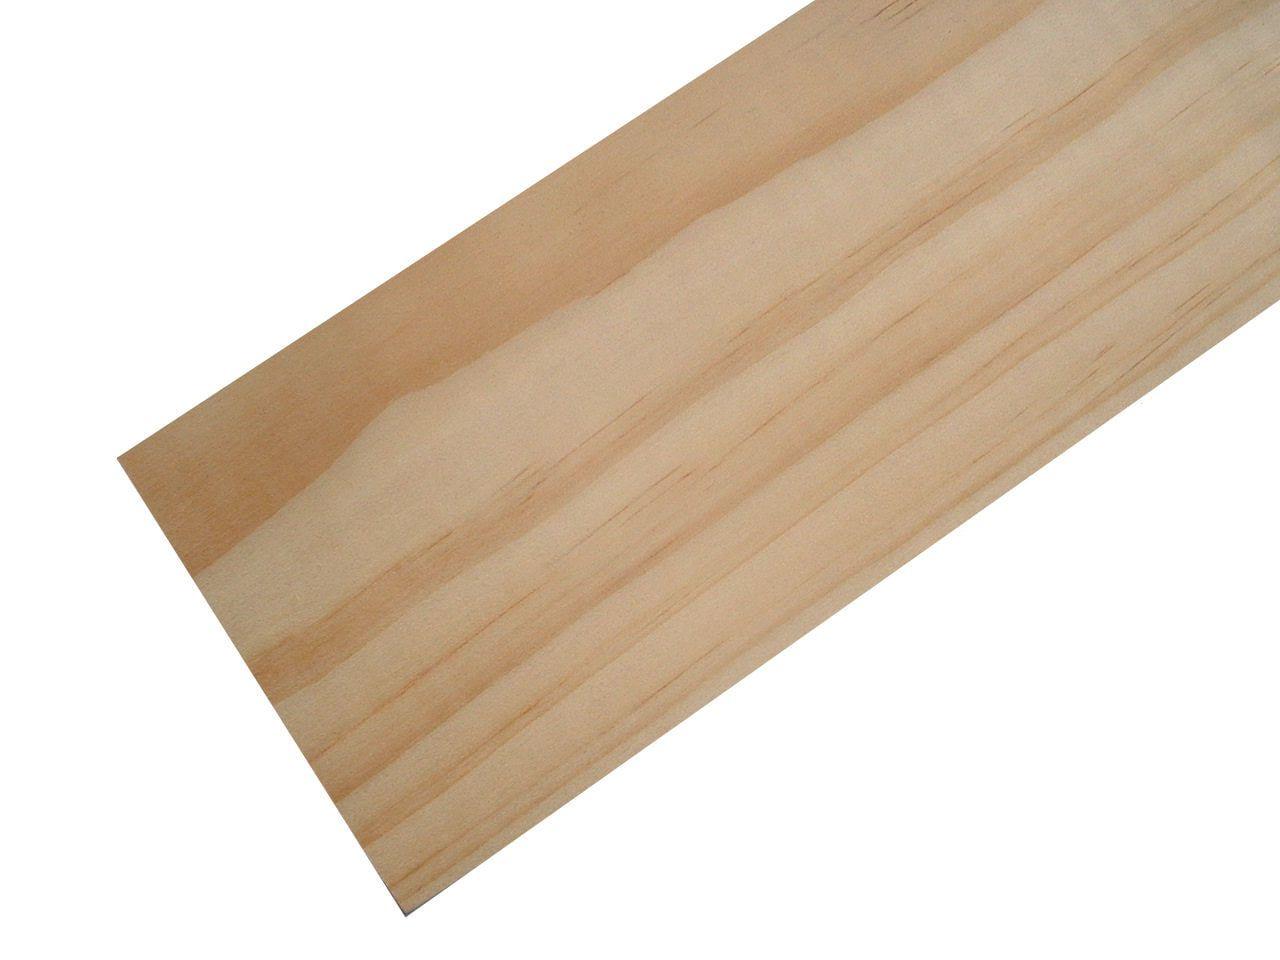 Spruce Wood Panels